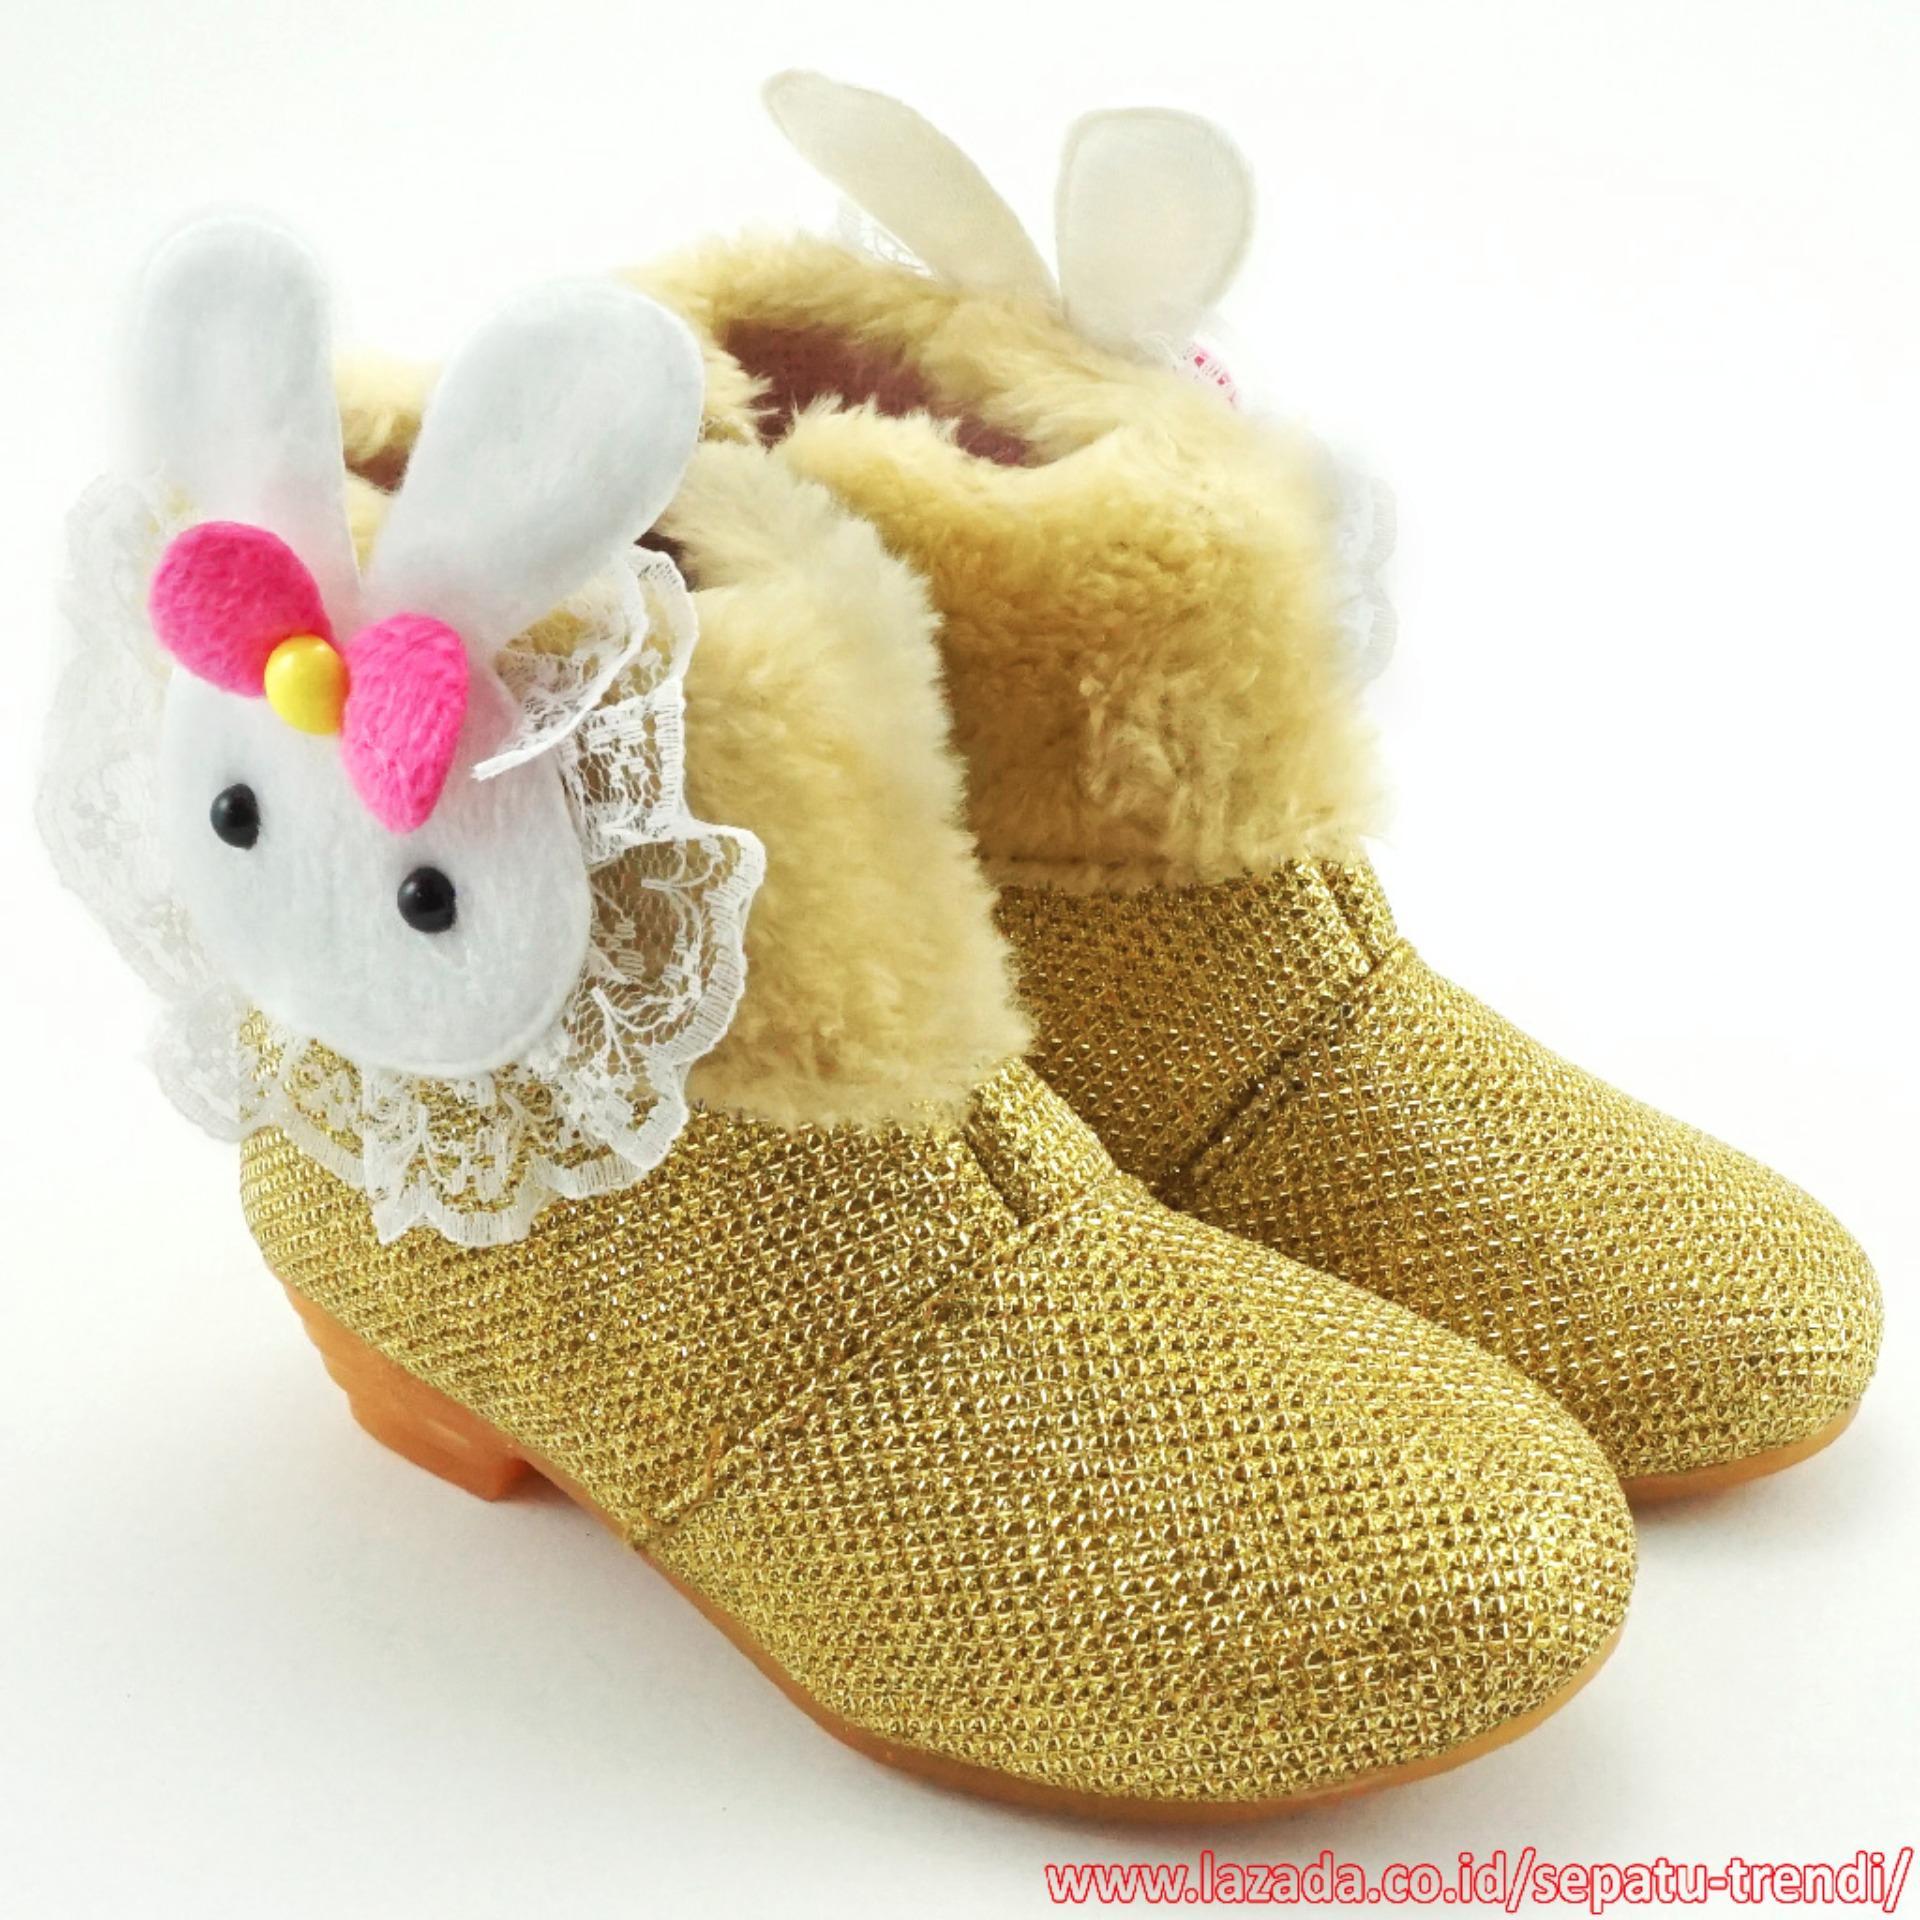 Harga Trendishoes Sepatu Boot Anak Perempuan Bahan Glitter Boneka Bulu Gold Baru